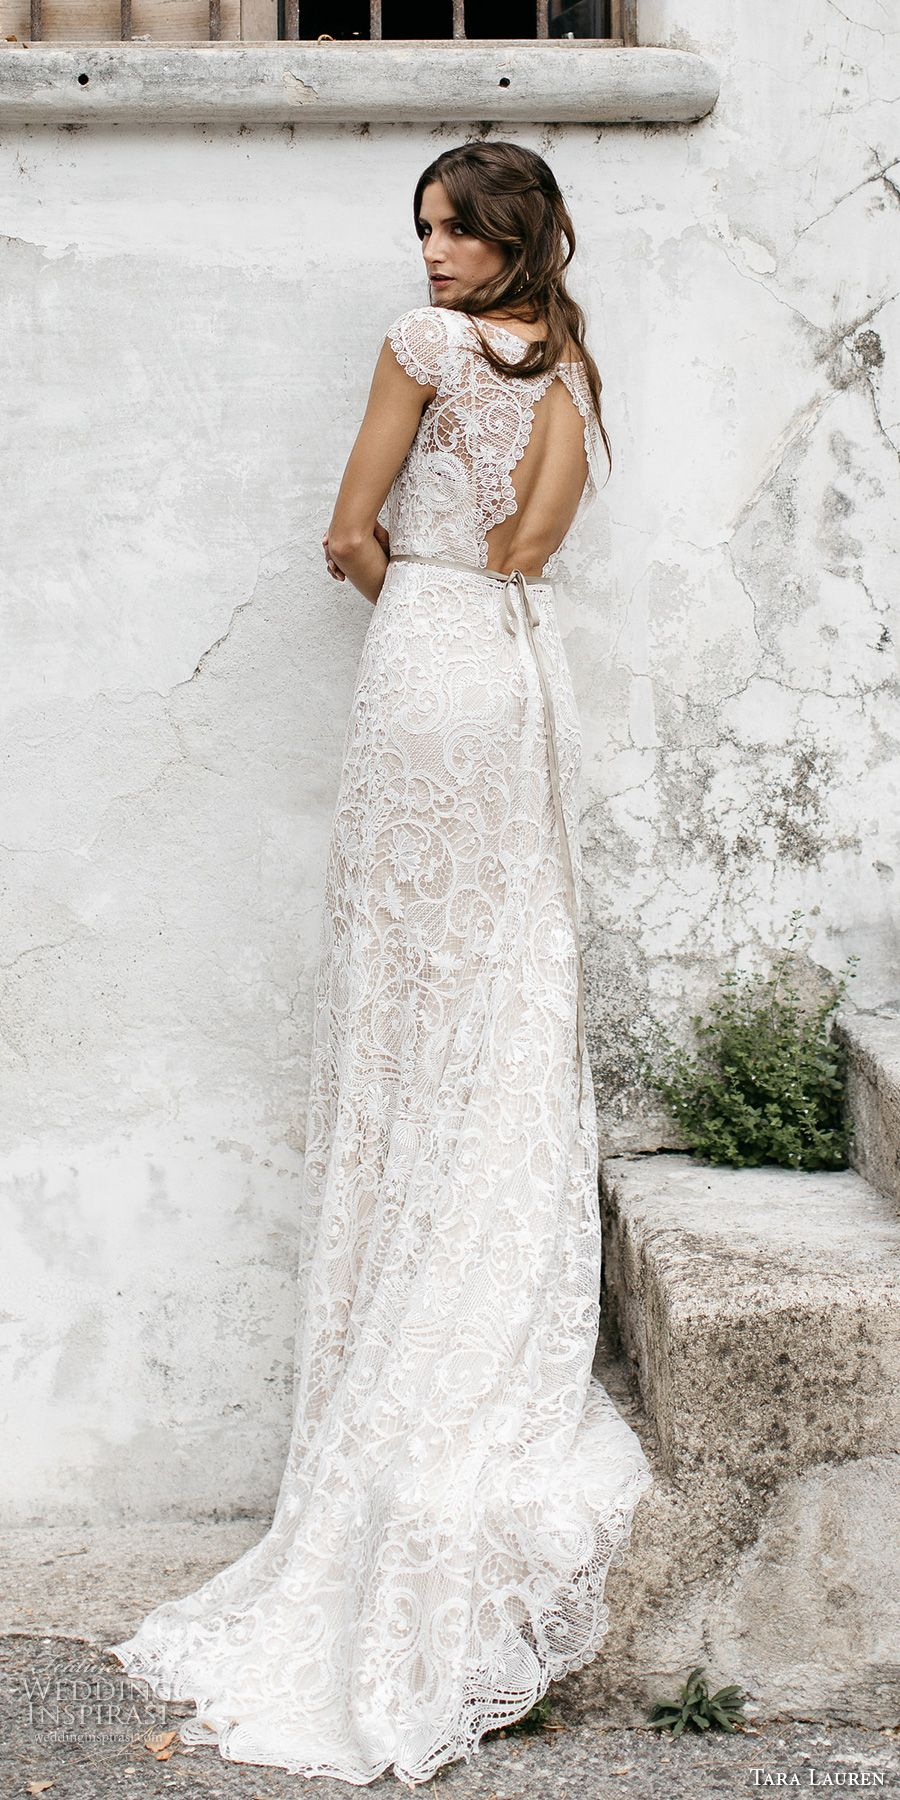 Wedding dress with short front and long back  tara lauren spring  bridal cap sleeves bateau neckline full